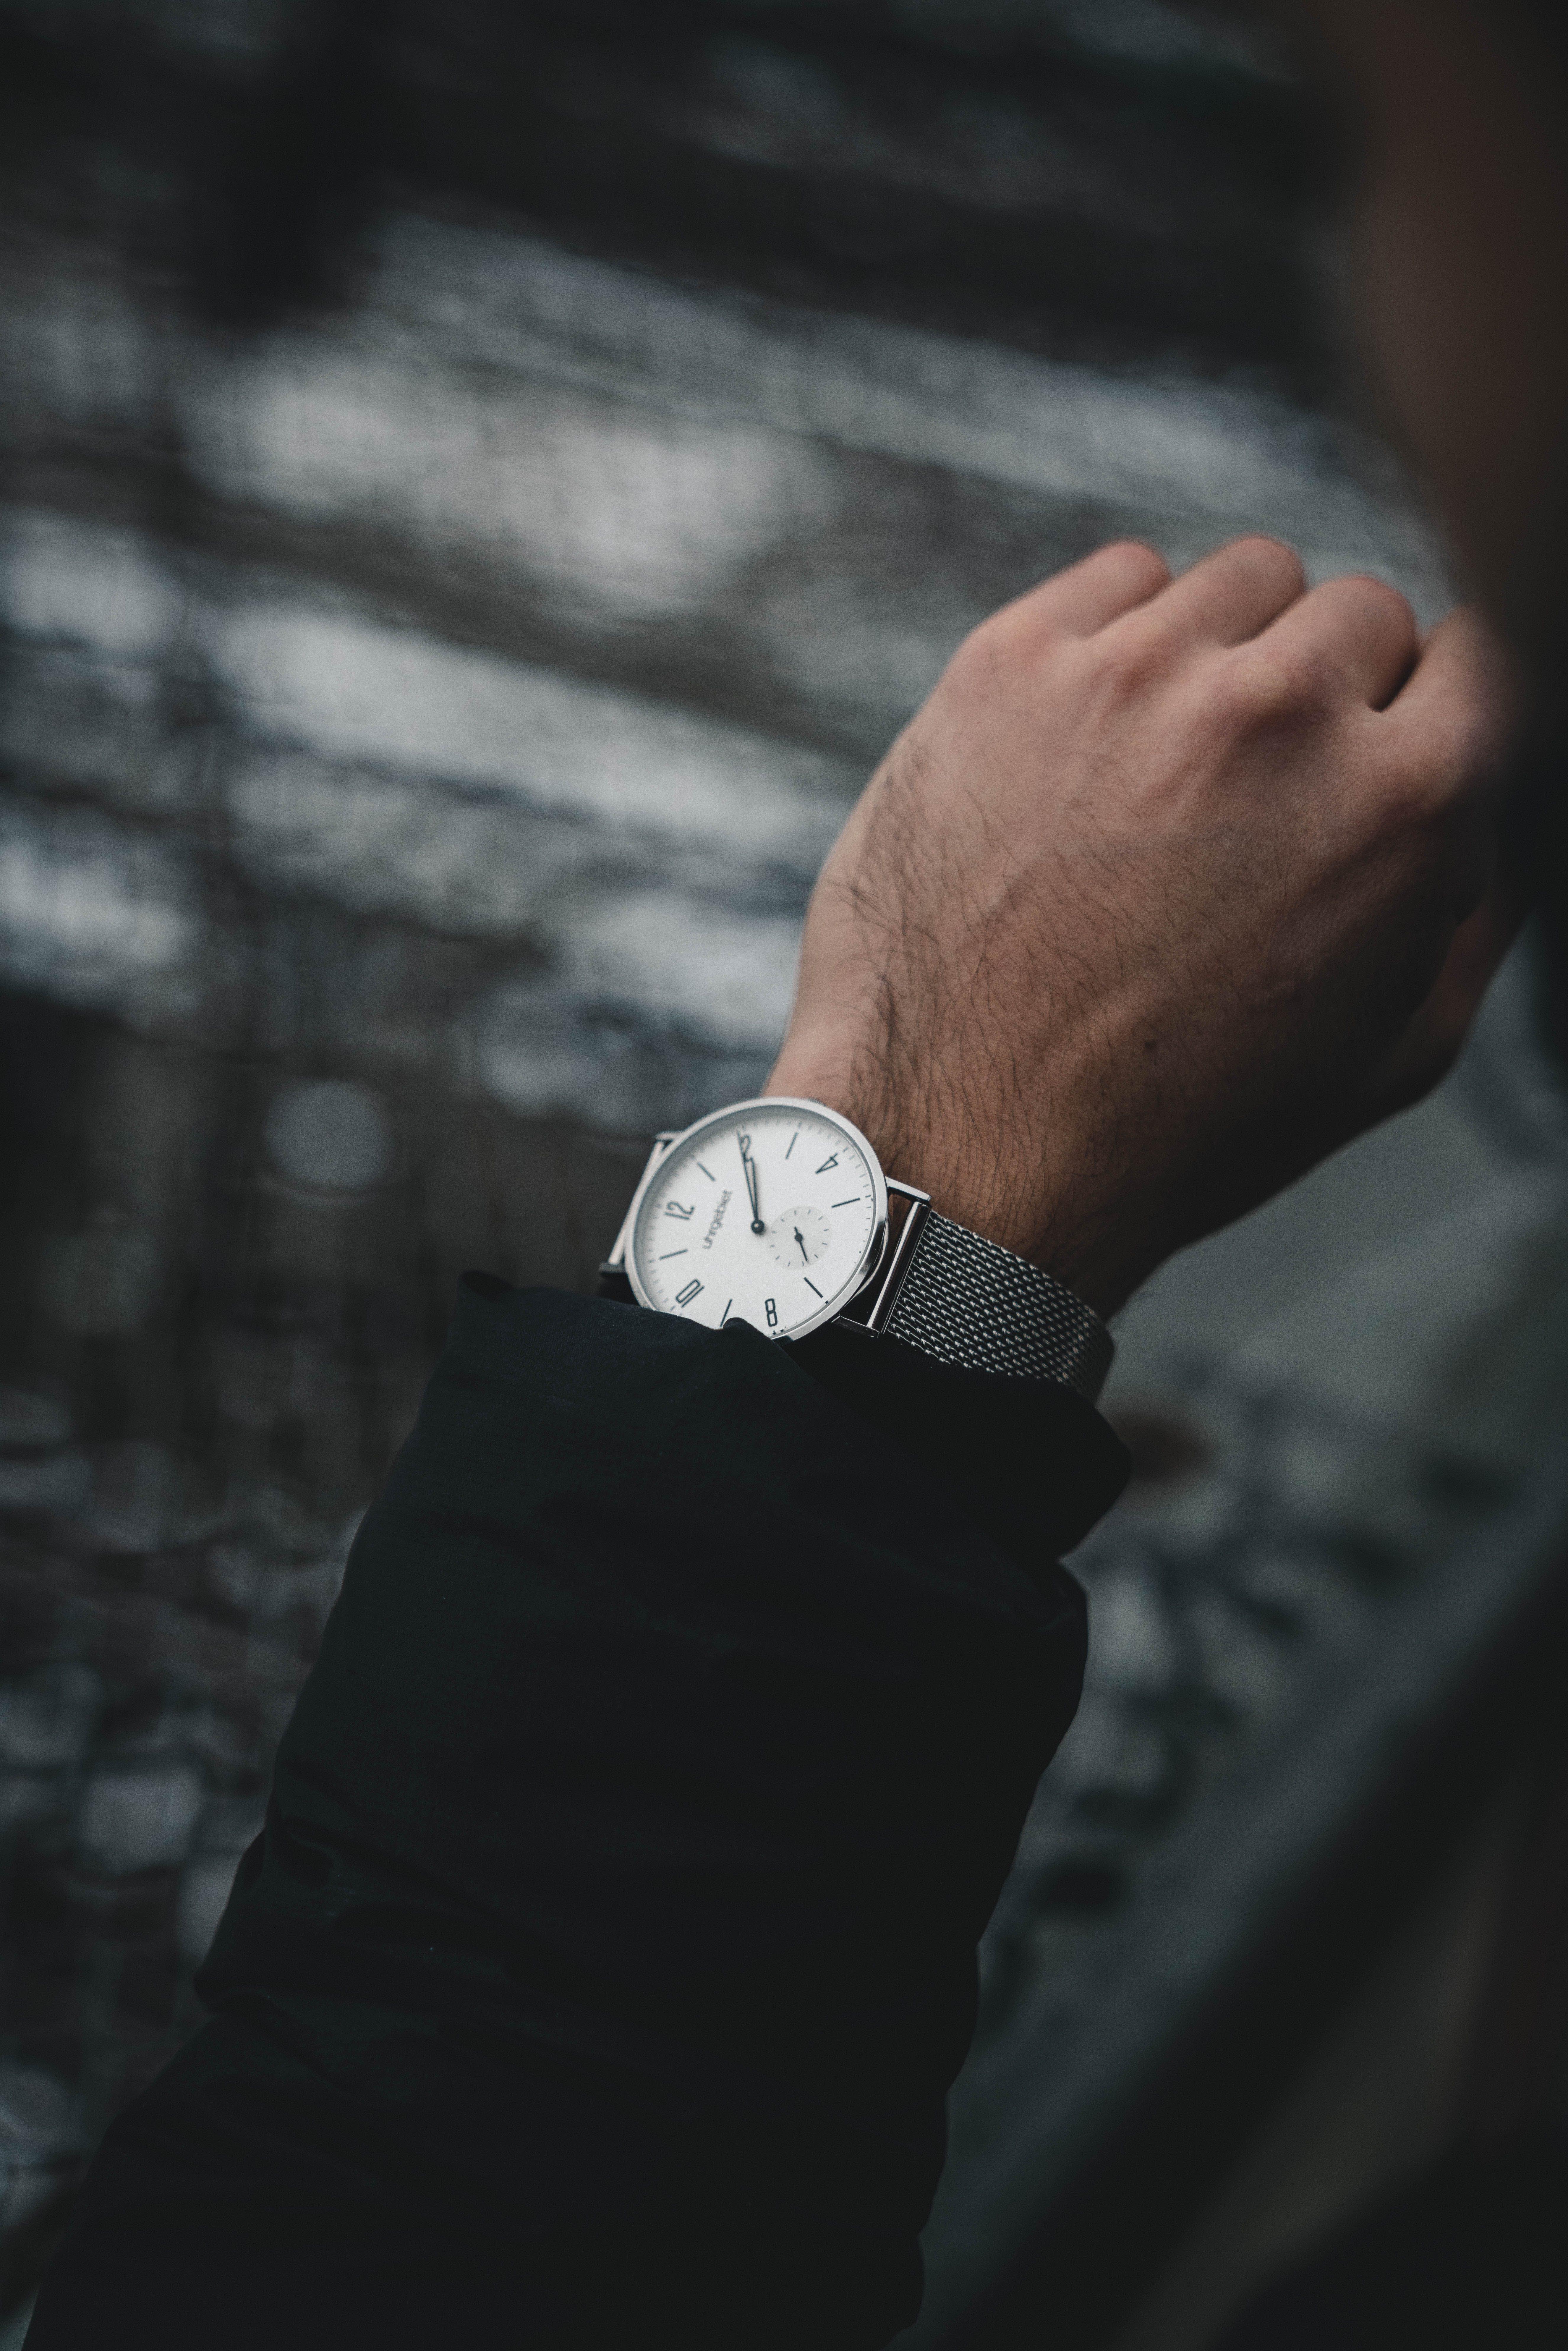 Kostenloses Stock Foto zu accessoire, armbanduhr, hand, handgelenk